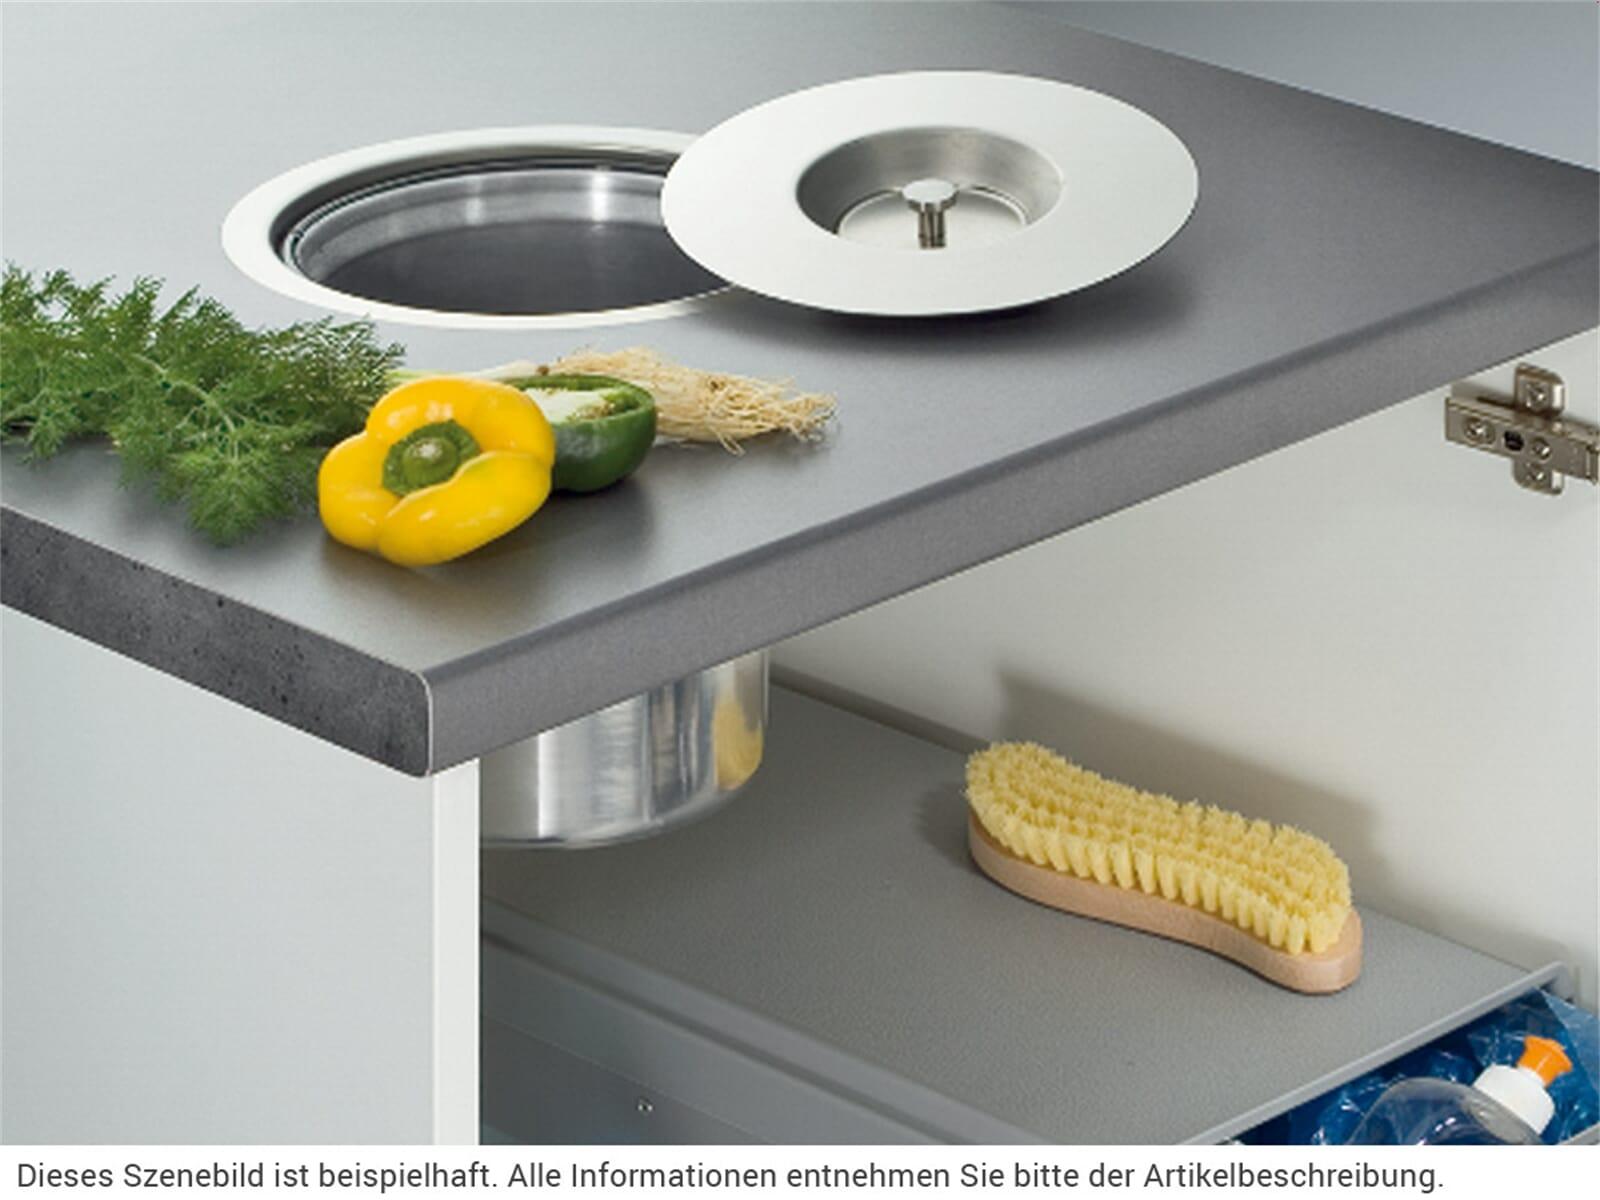 wesco ergomaster 060300 47 einbau abfallsammler. Black Bedroom Furniture Sets. Home Design Ideas